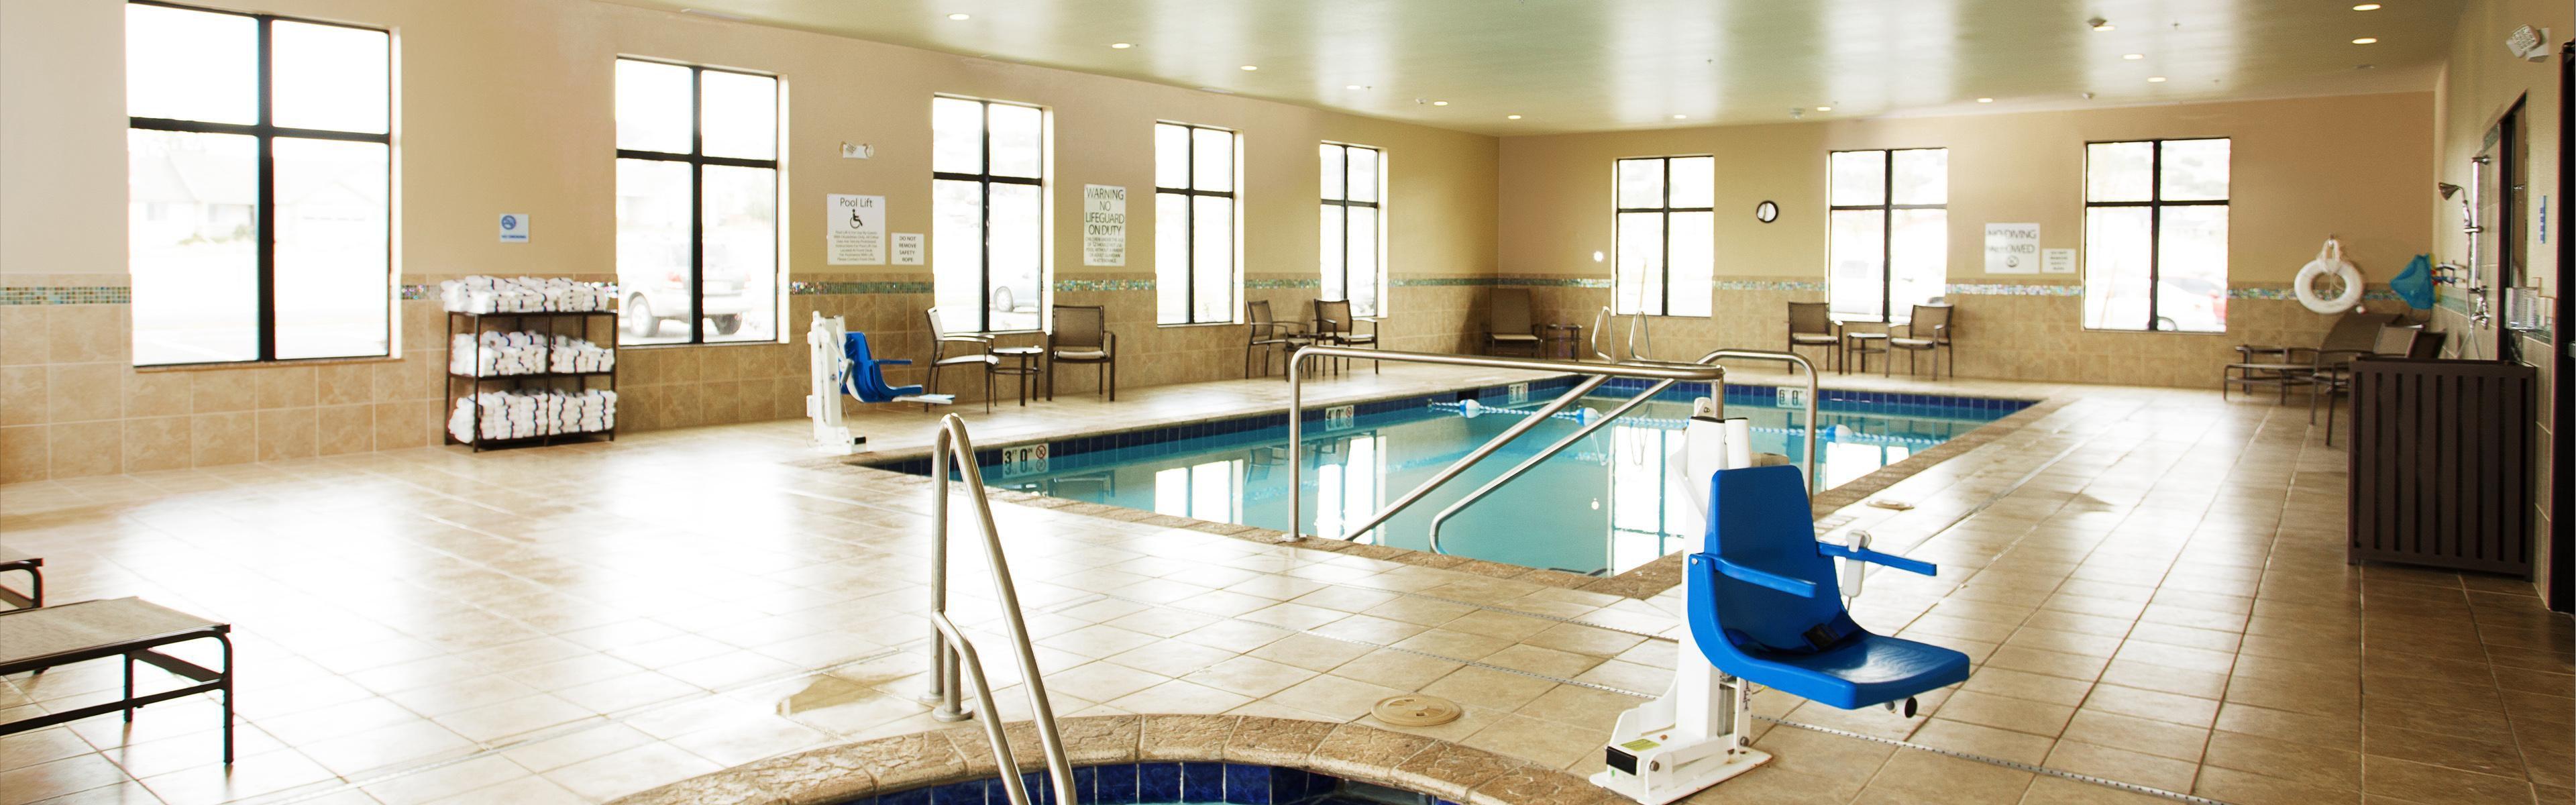 Holiday Inn Express & Suites Pocatello image 2